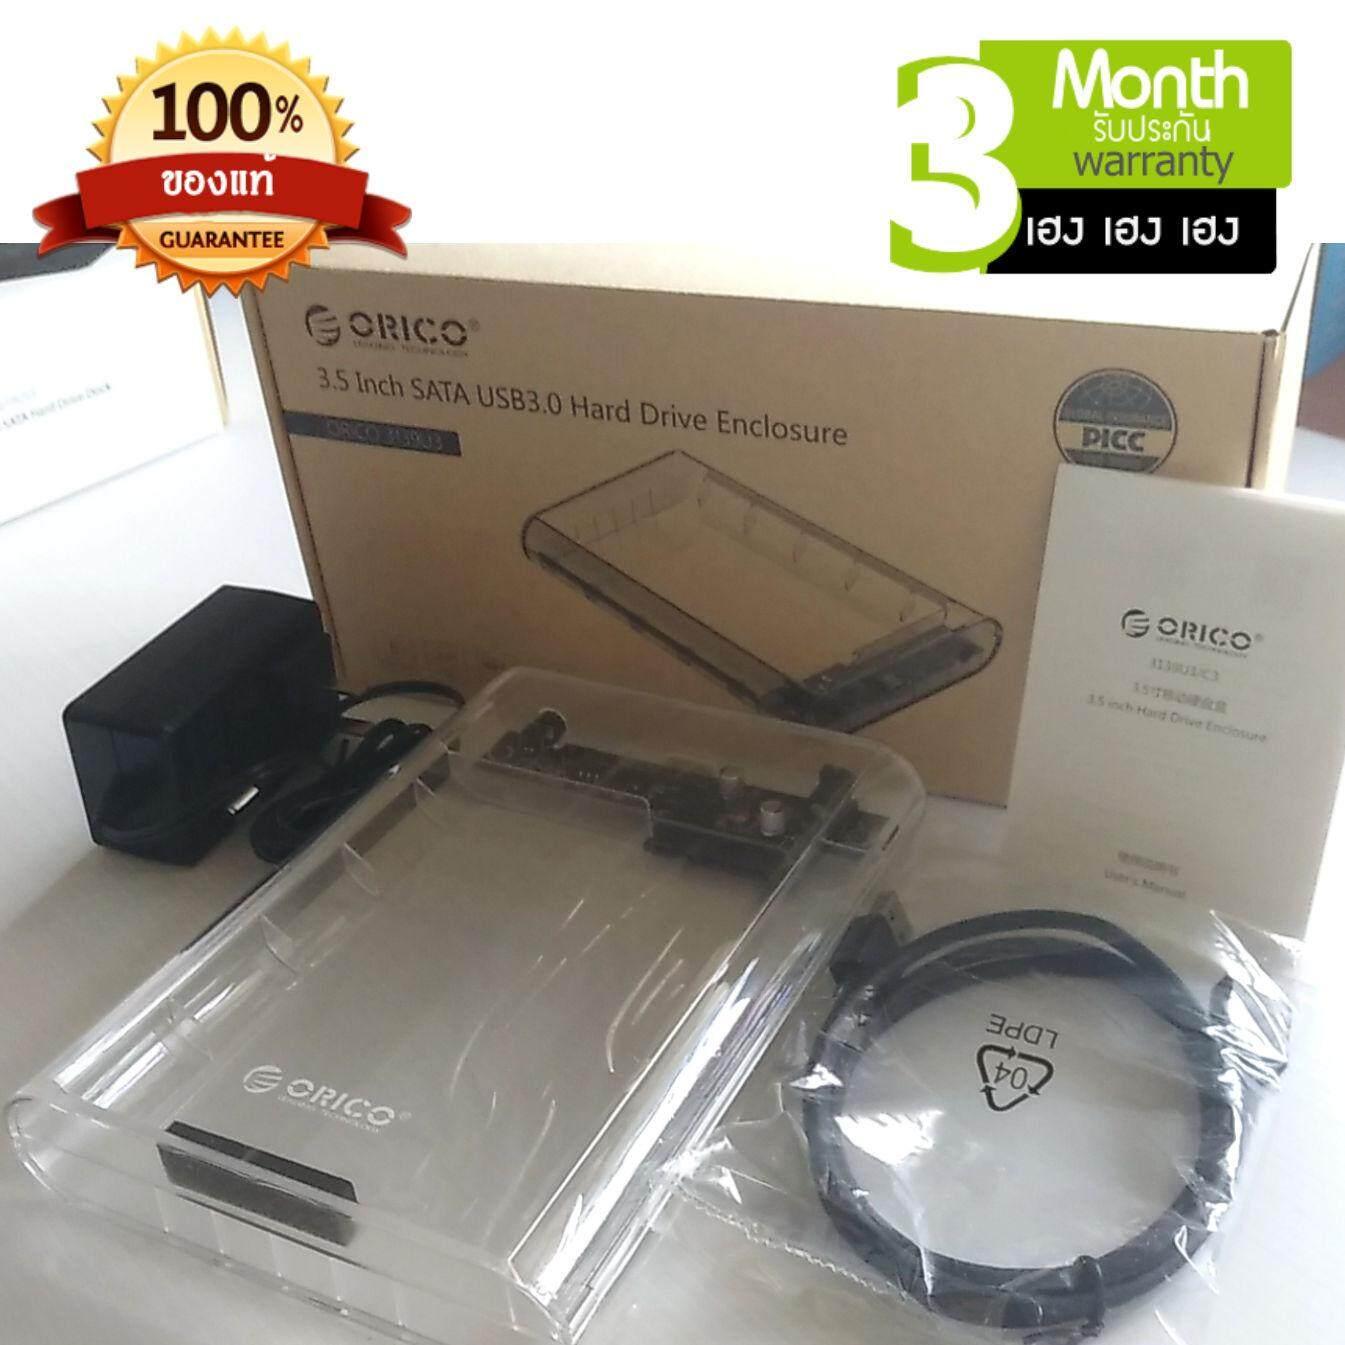 Sell Orico 9528u3 3 Cheapest Best Quality Th Store H7013 U3 Bk Bc 7 Ports Usb30 Hub Thb 650